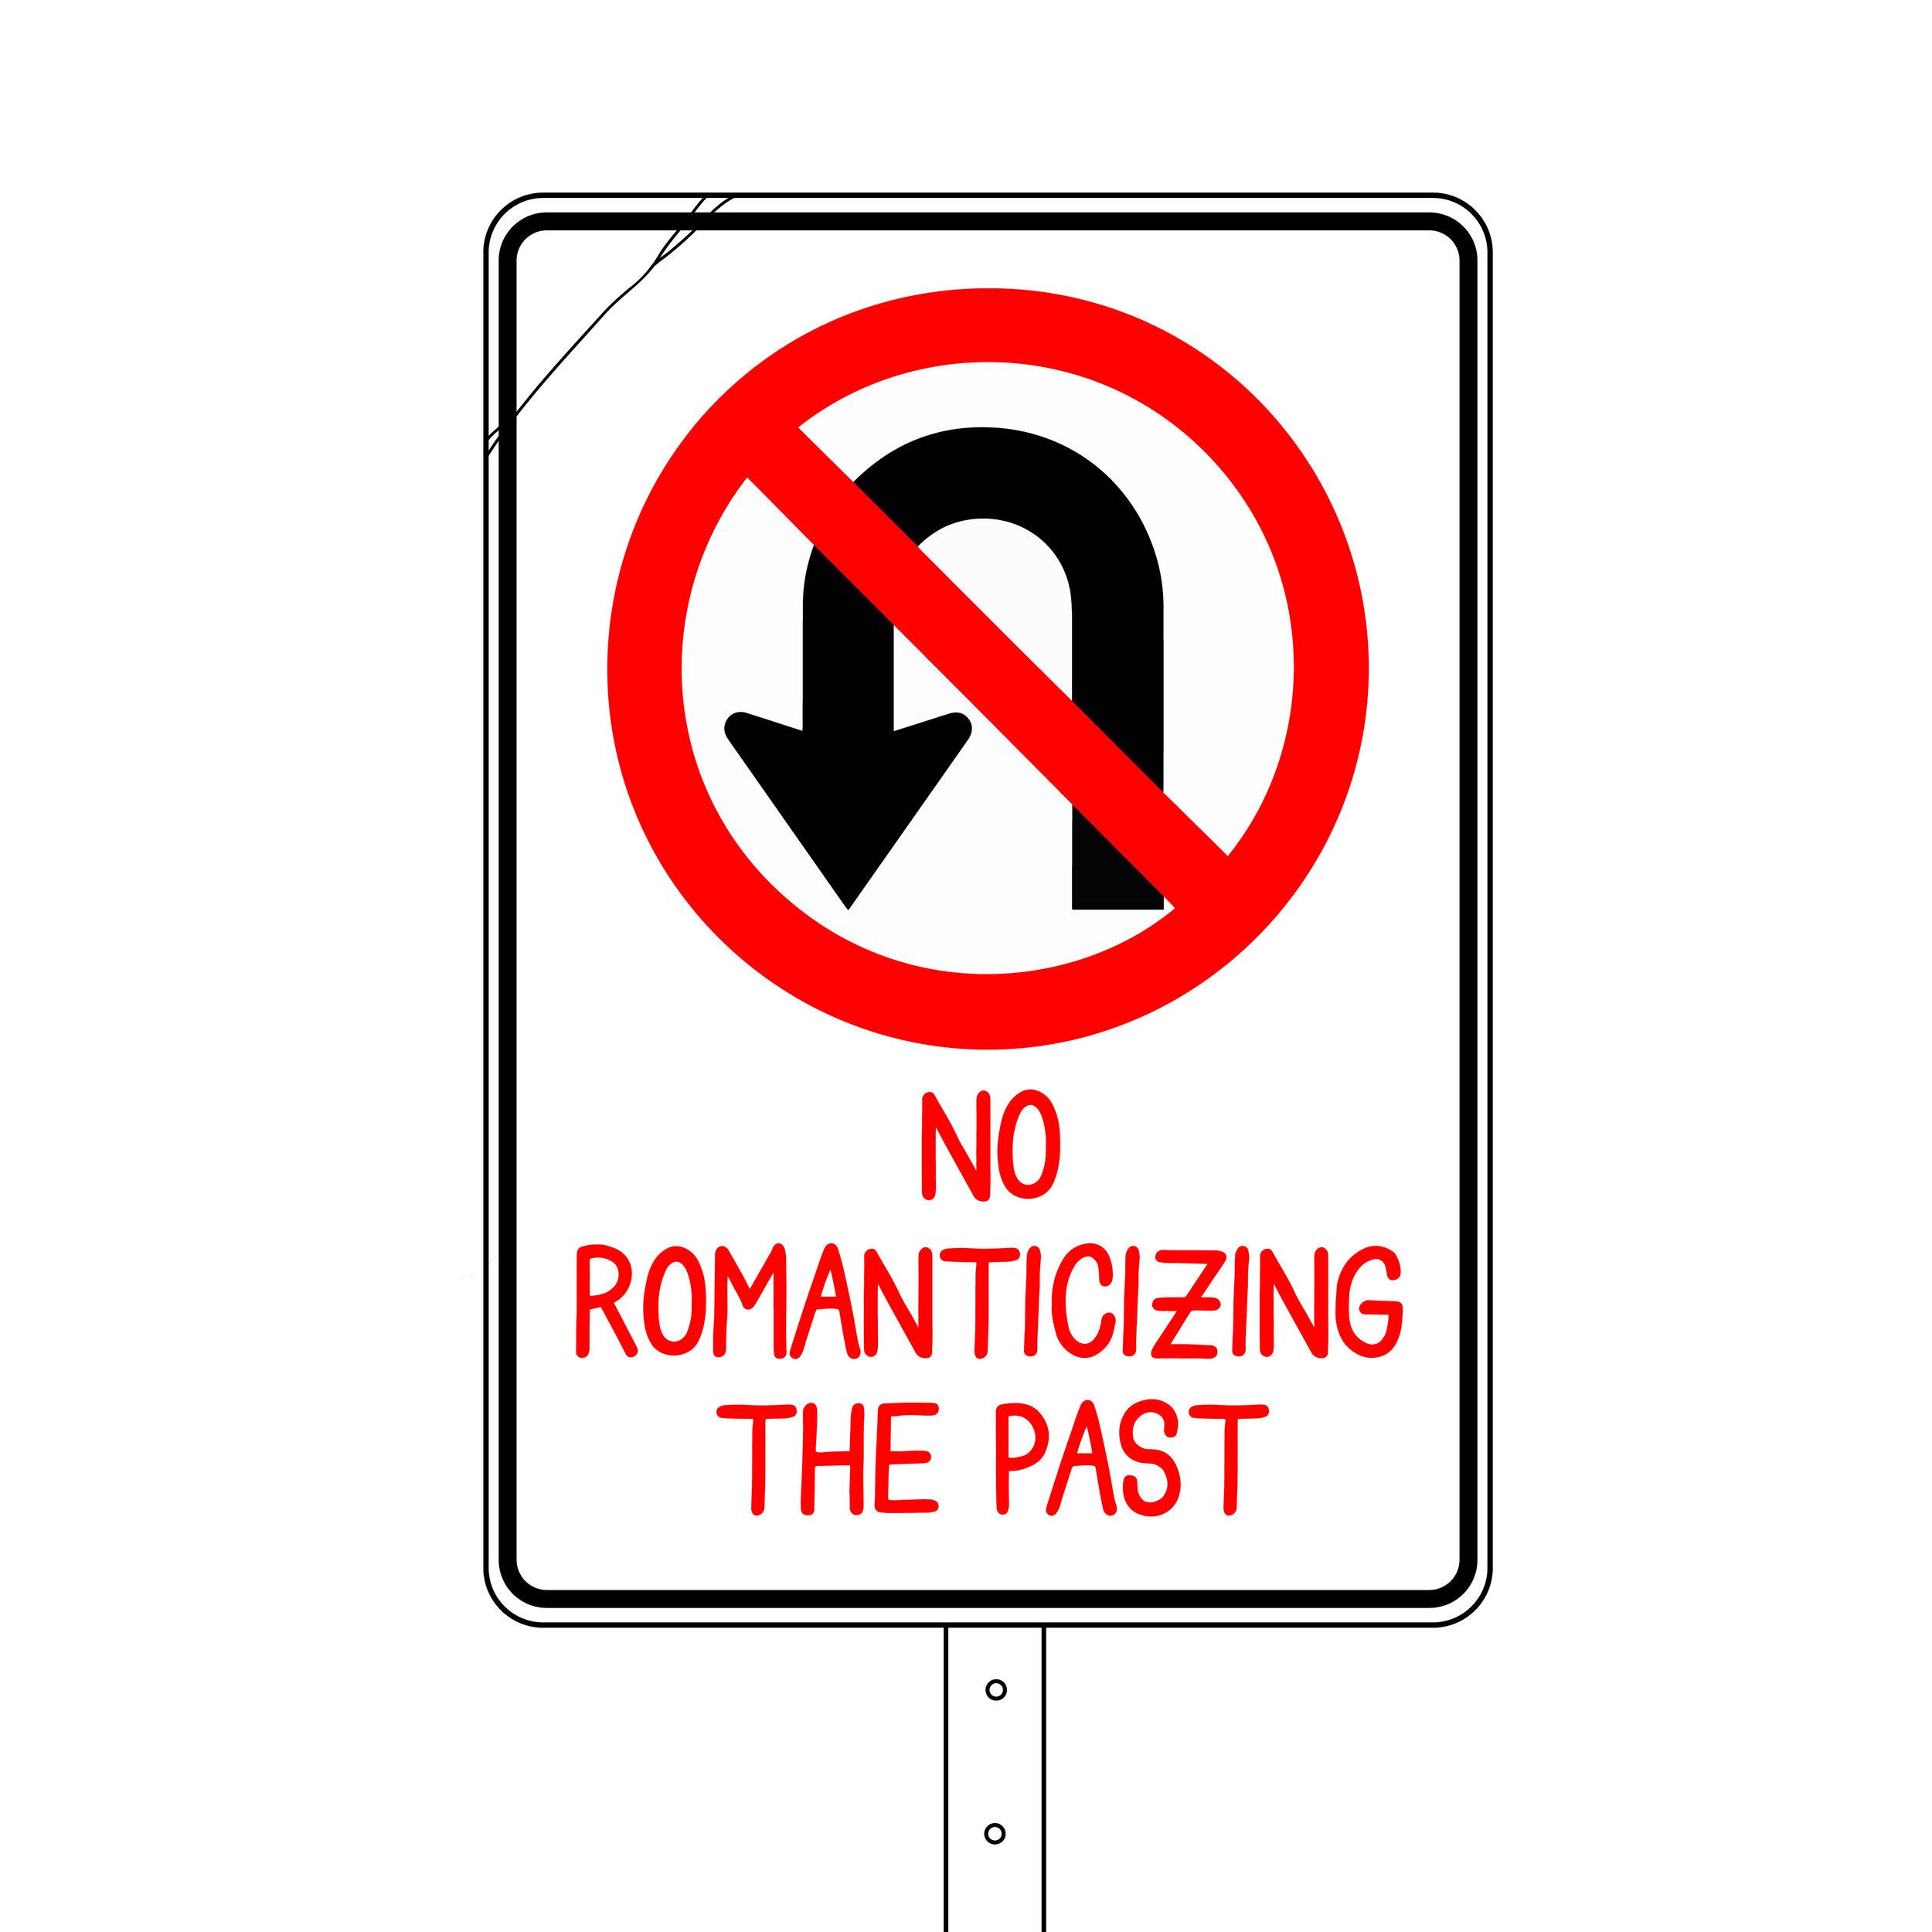 noromanticizingthepast-01.jpg